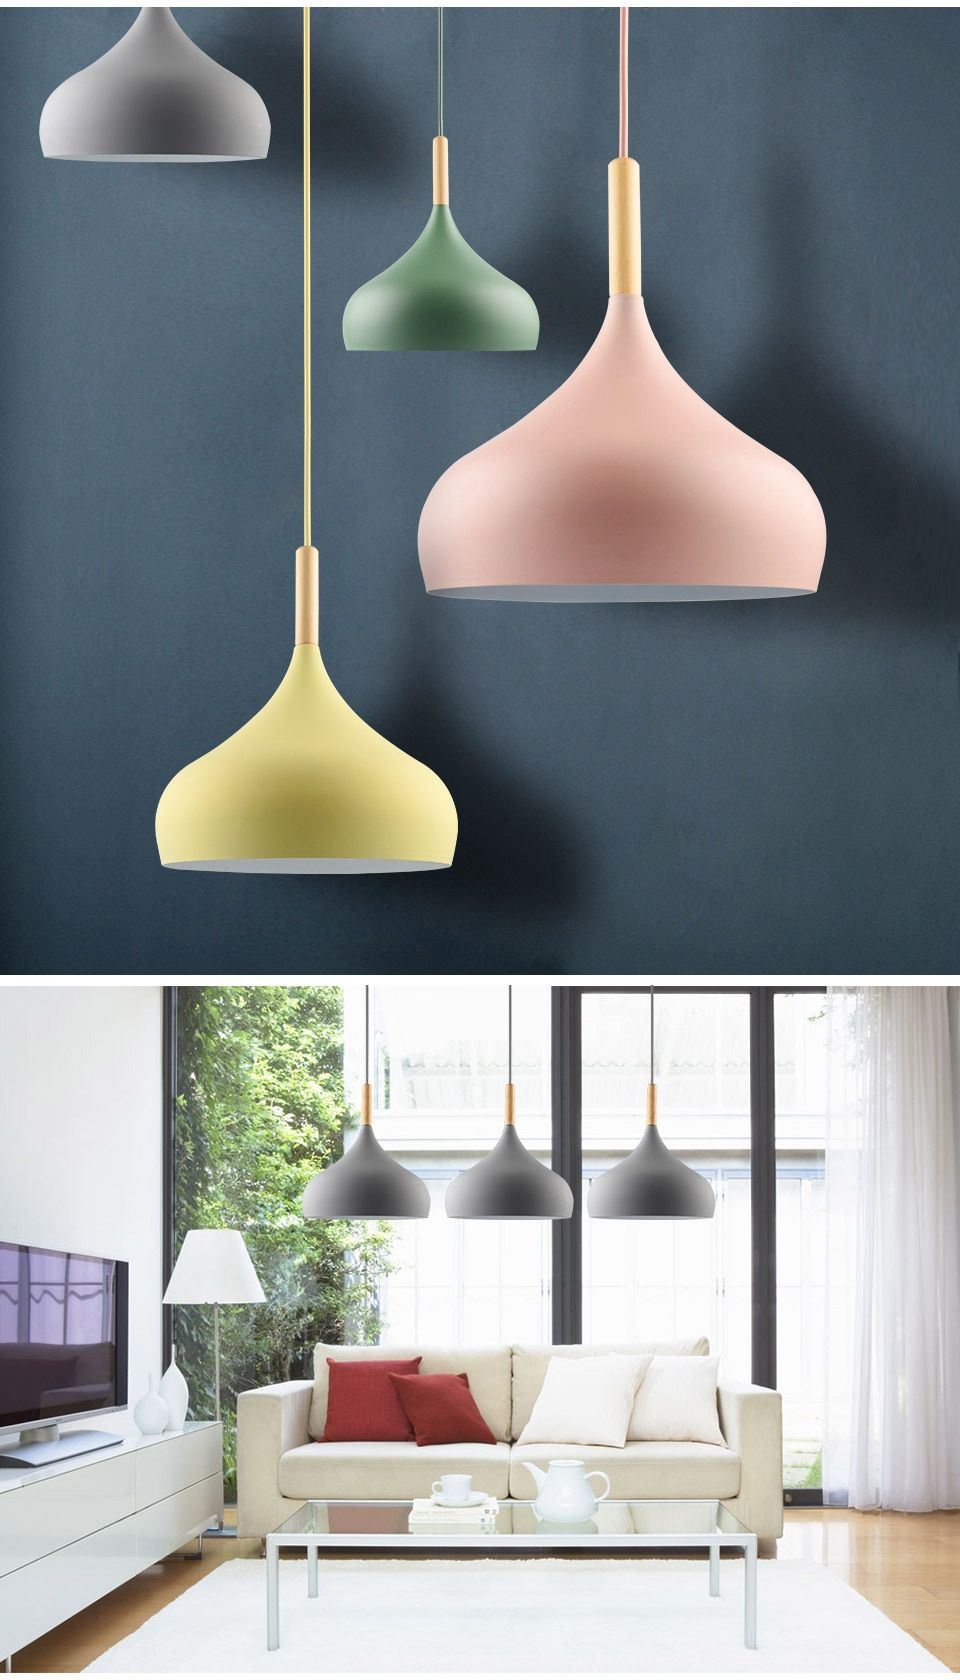 Flaviana Colorful Pendant Light | Lamp light, Pendant